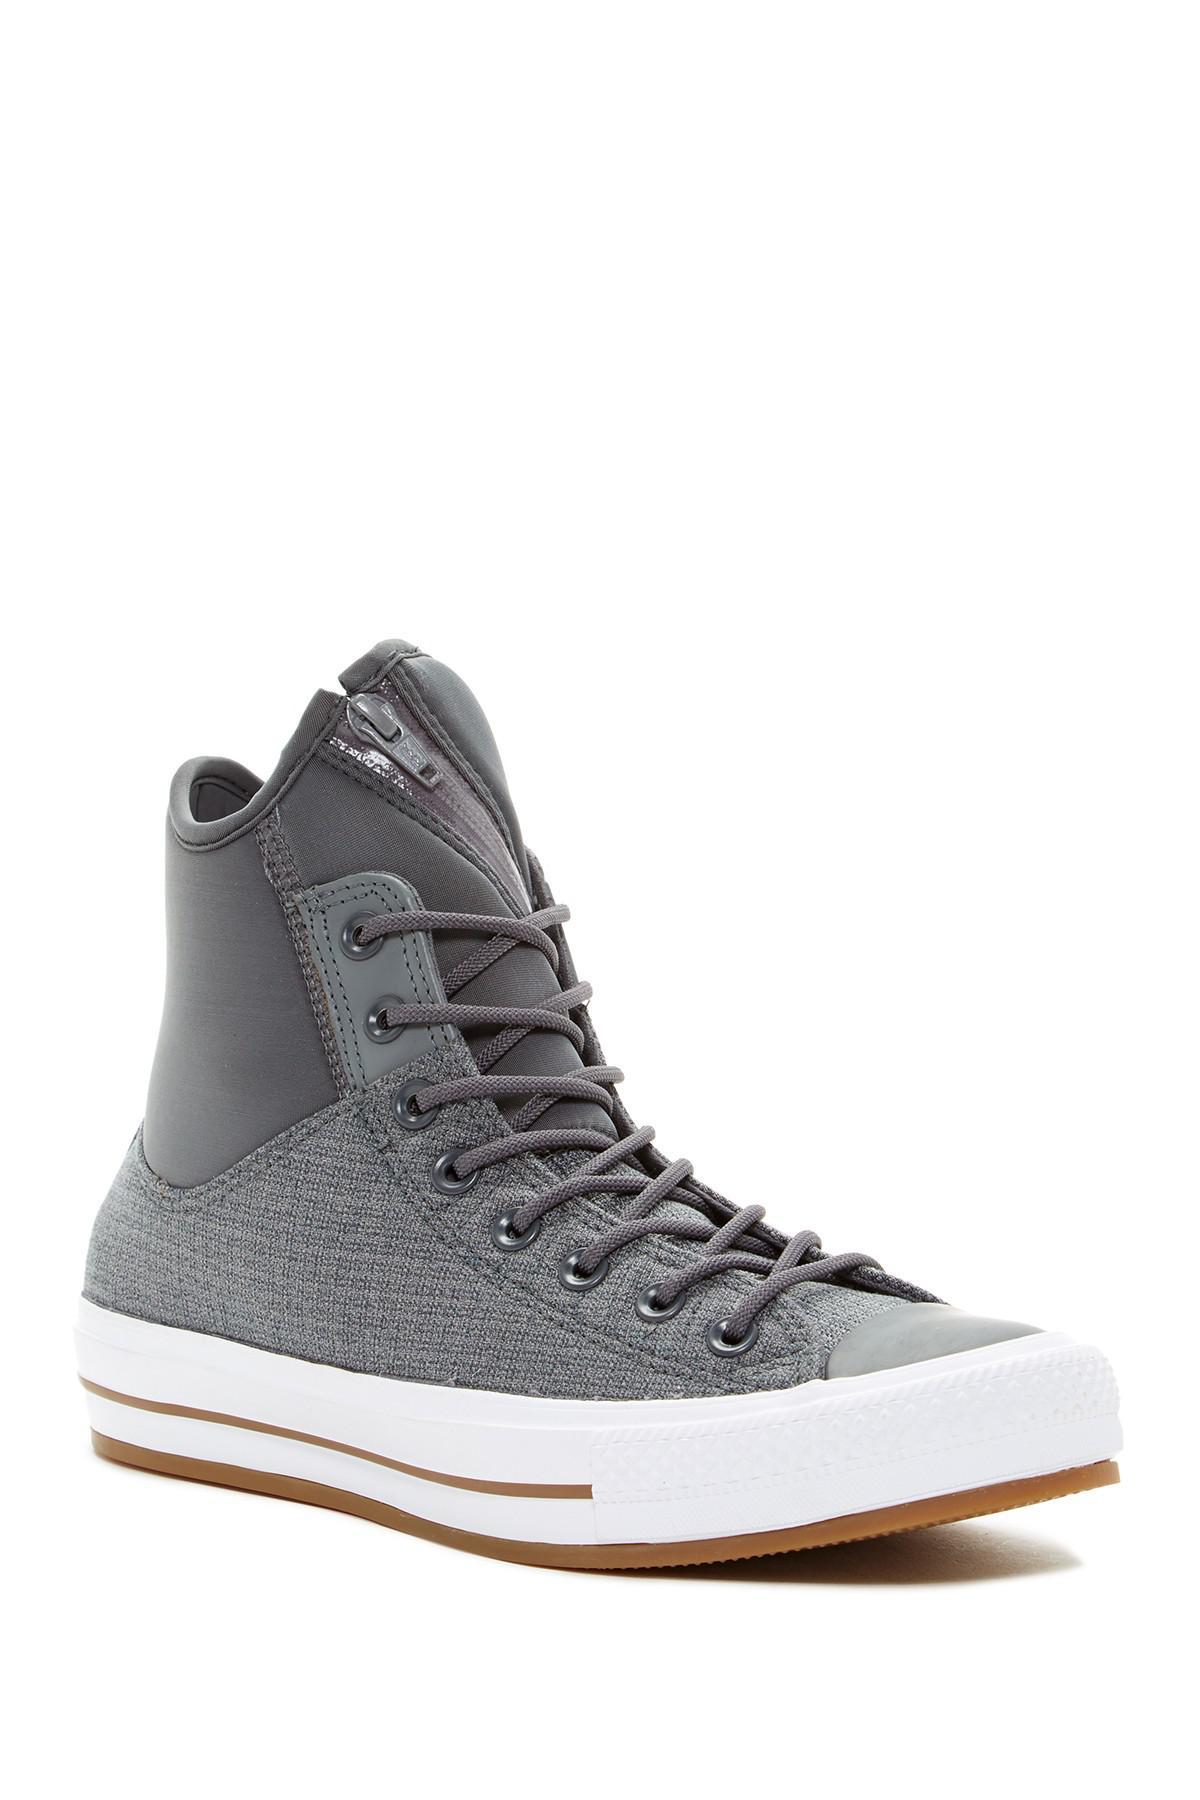 f7a37f6c2c12 Lyst - Converse Chuck Taylor All Star Ma-1 Se High Top Sneaker ...